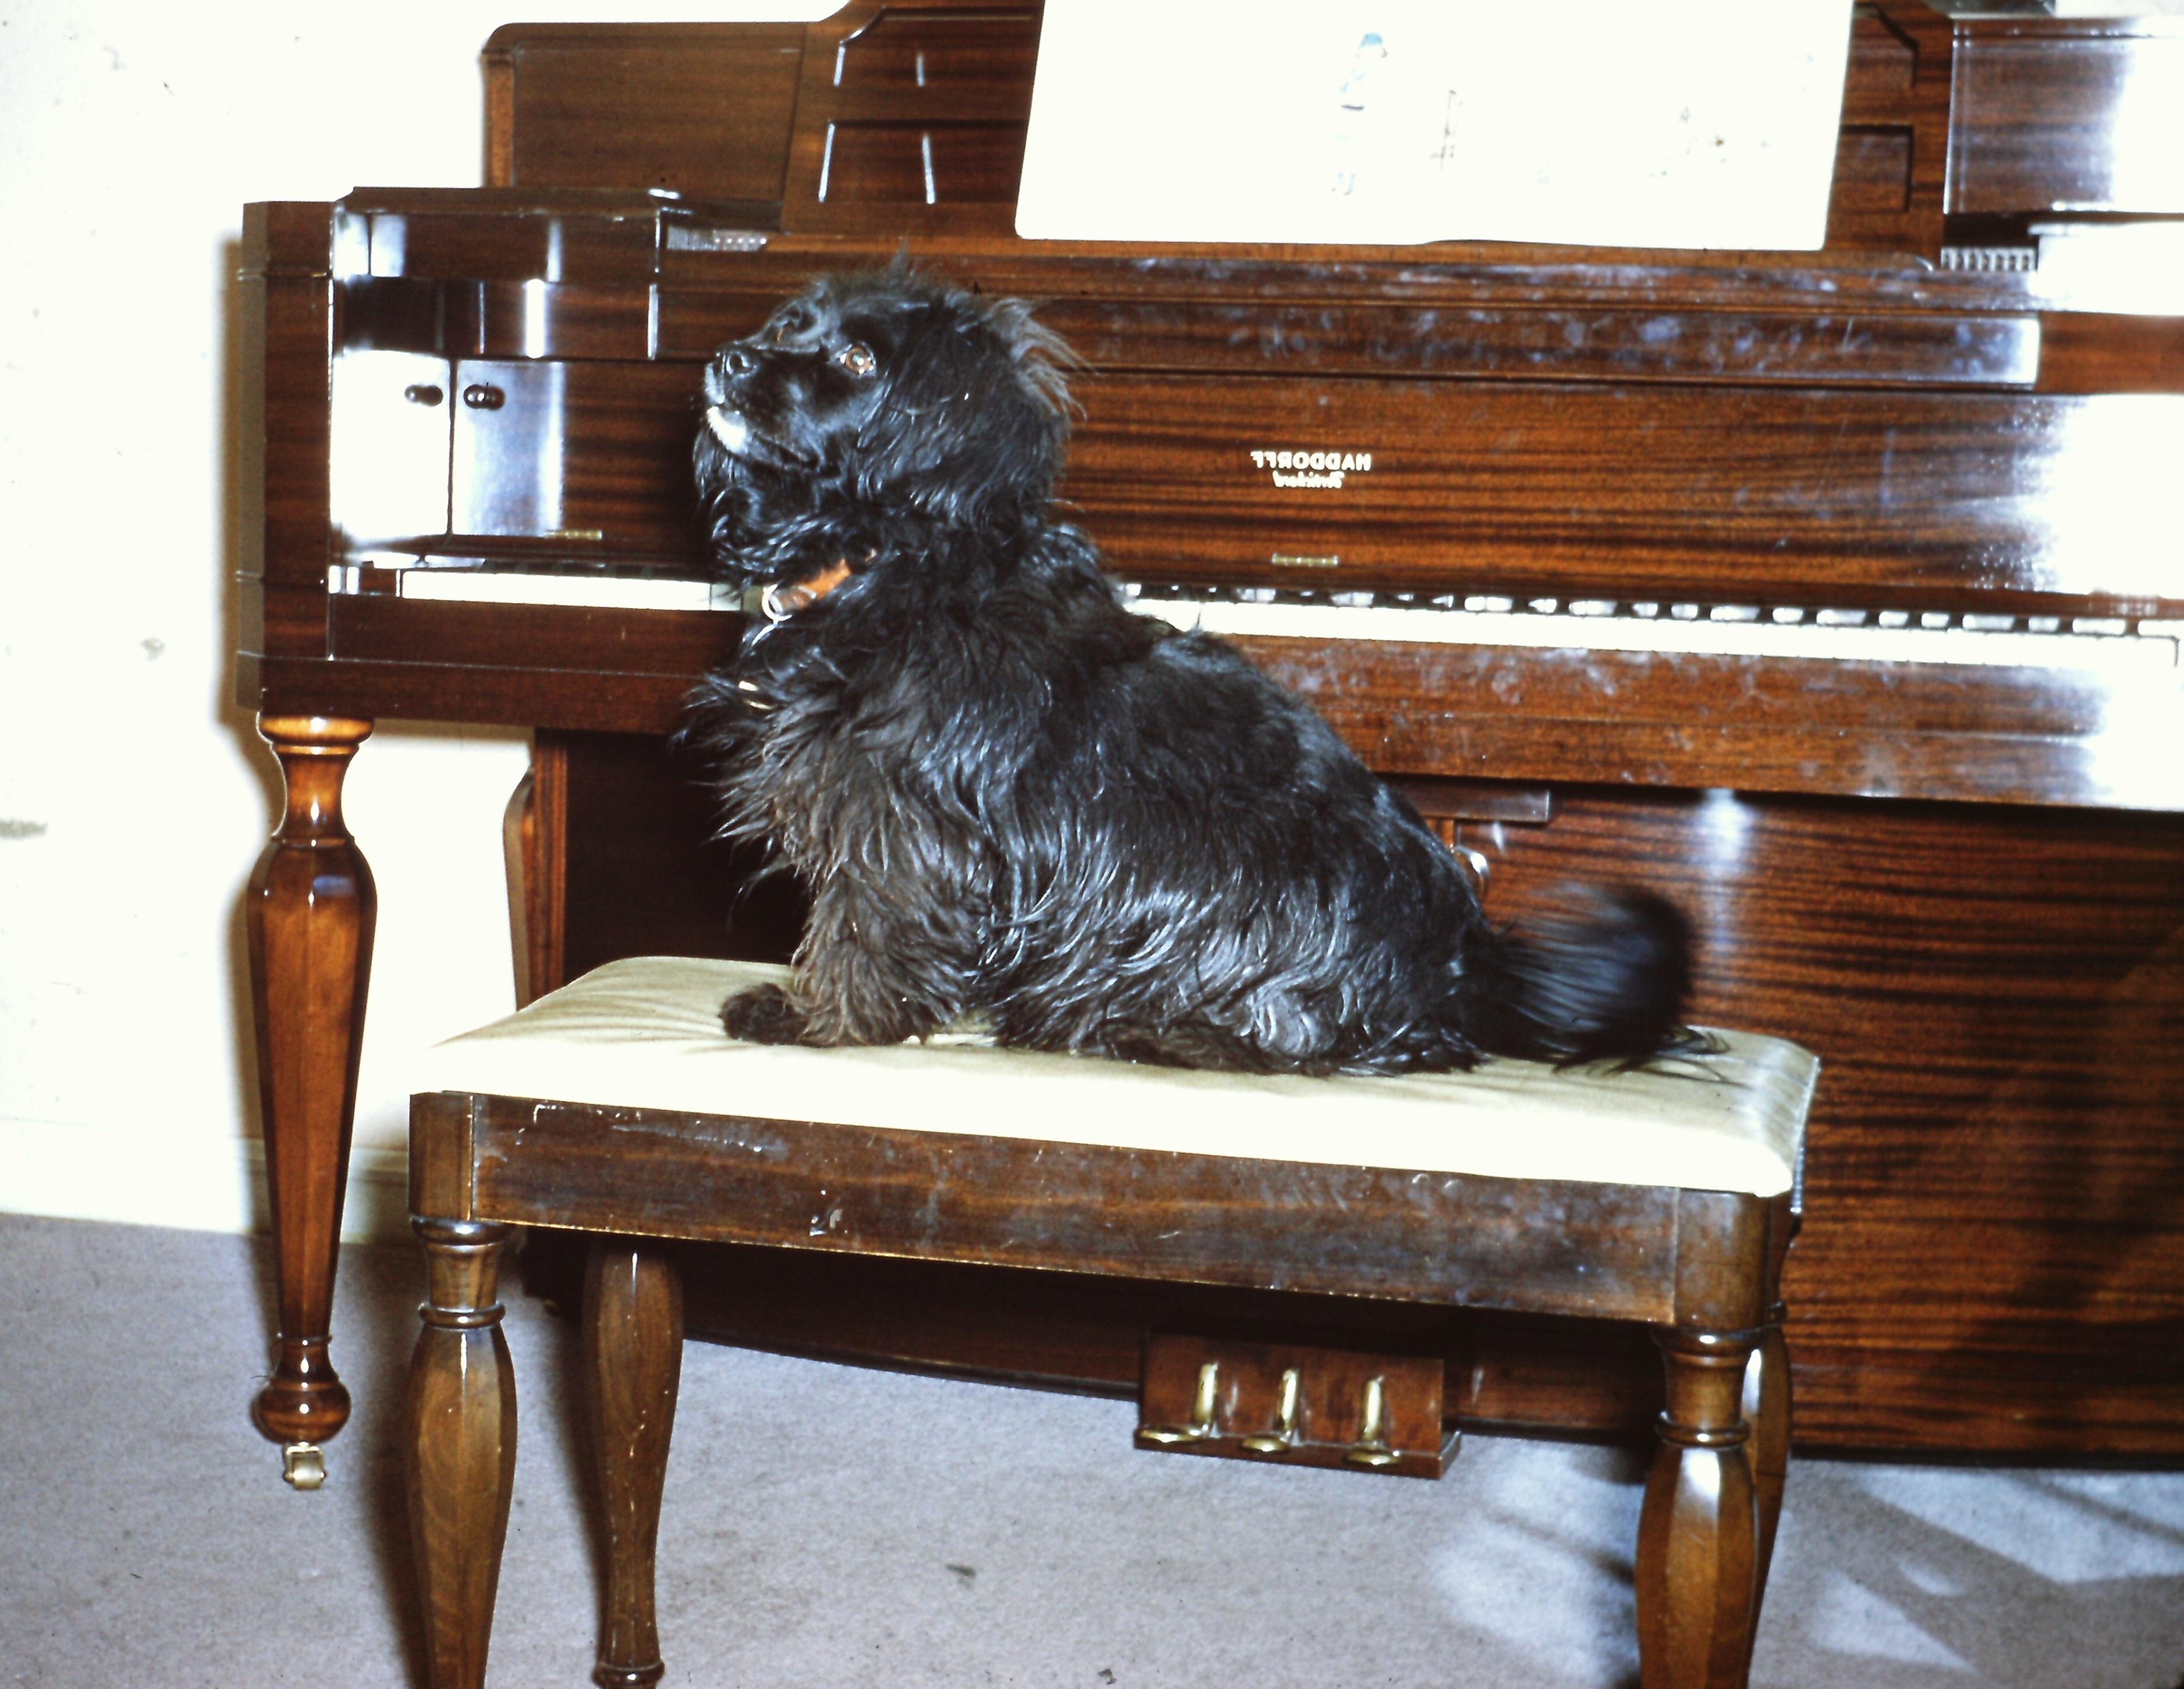 tippy-at-the-piano